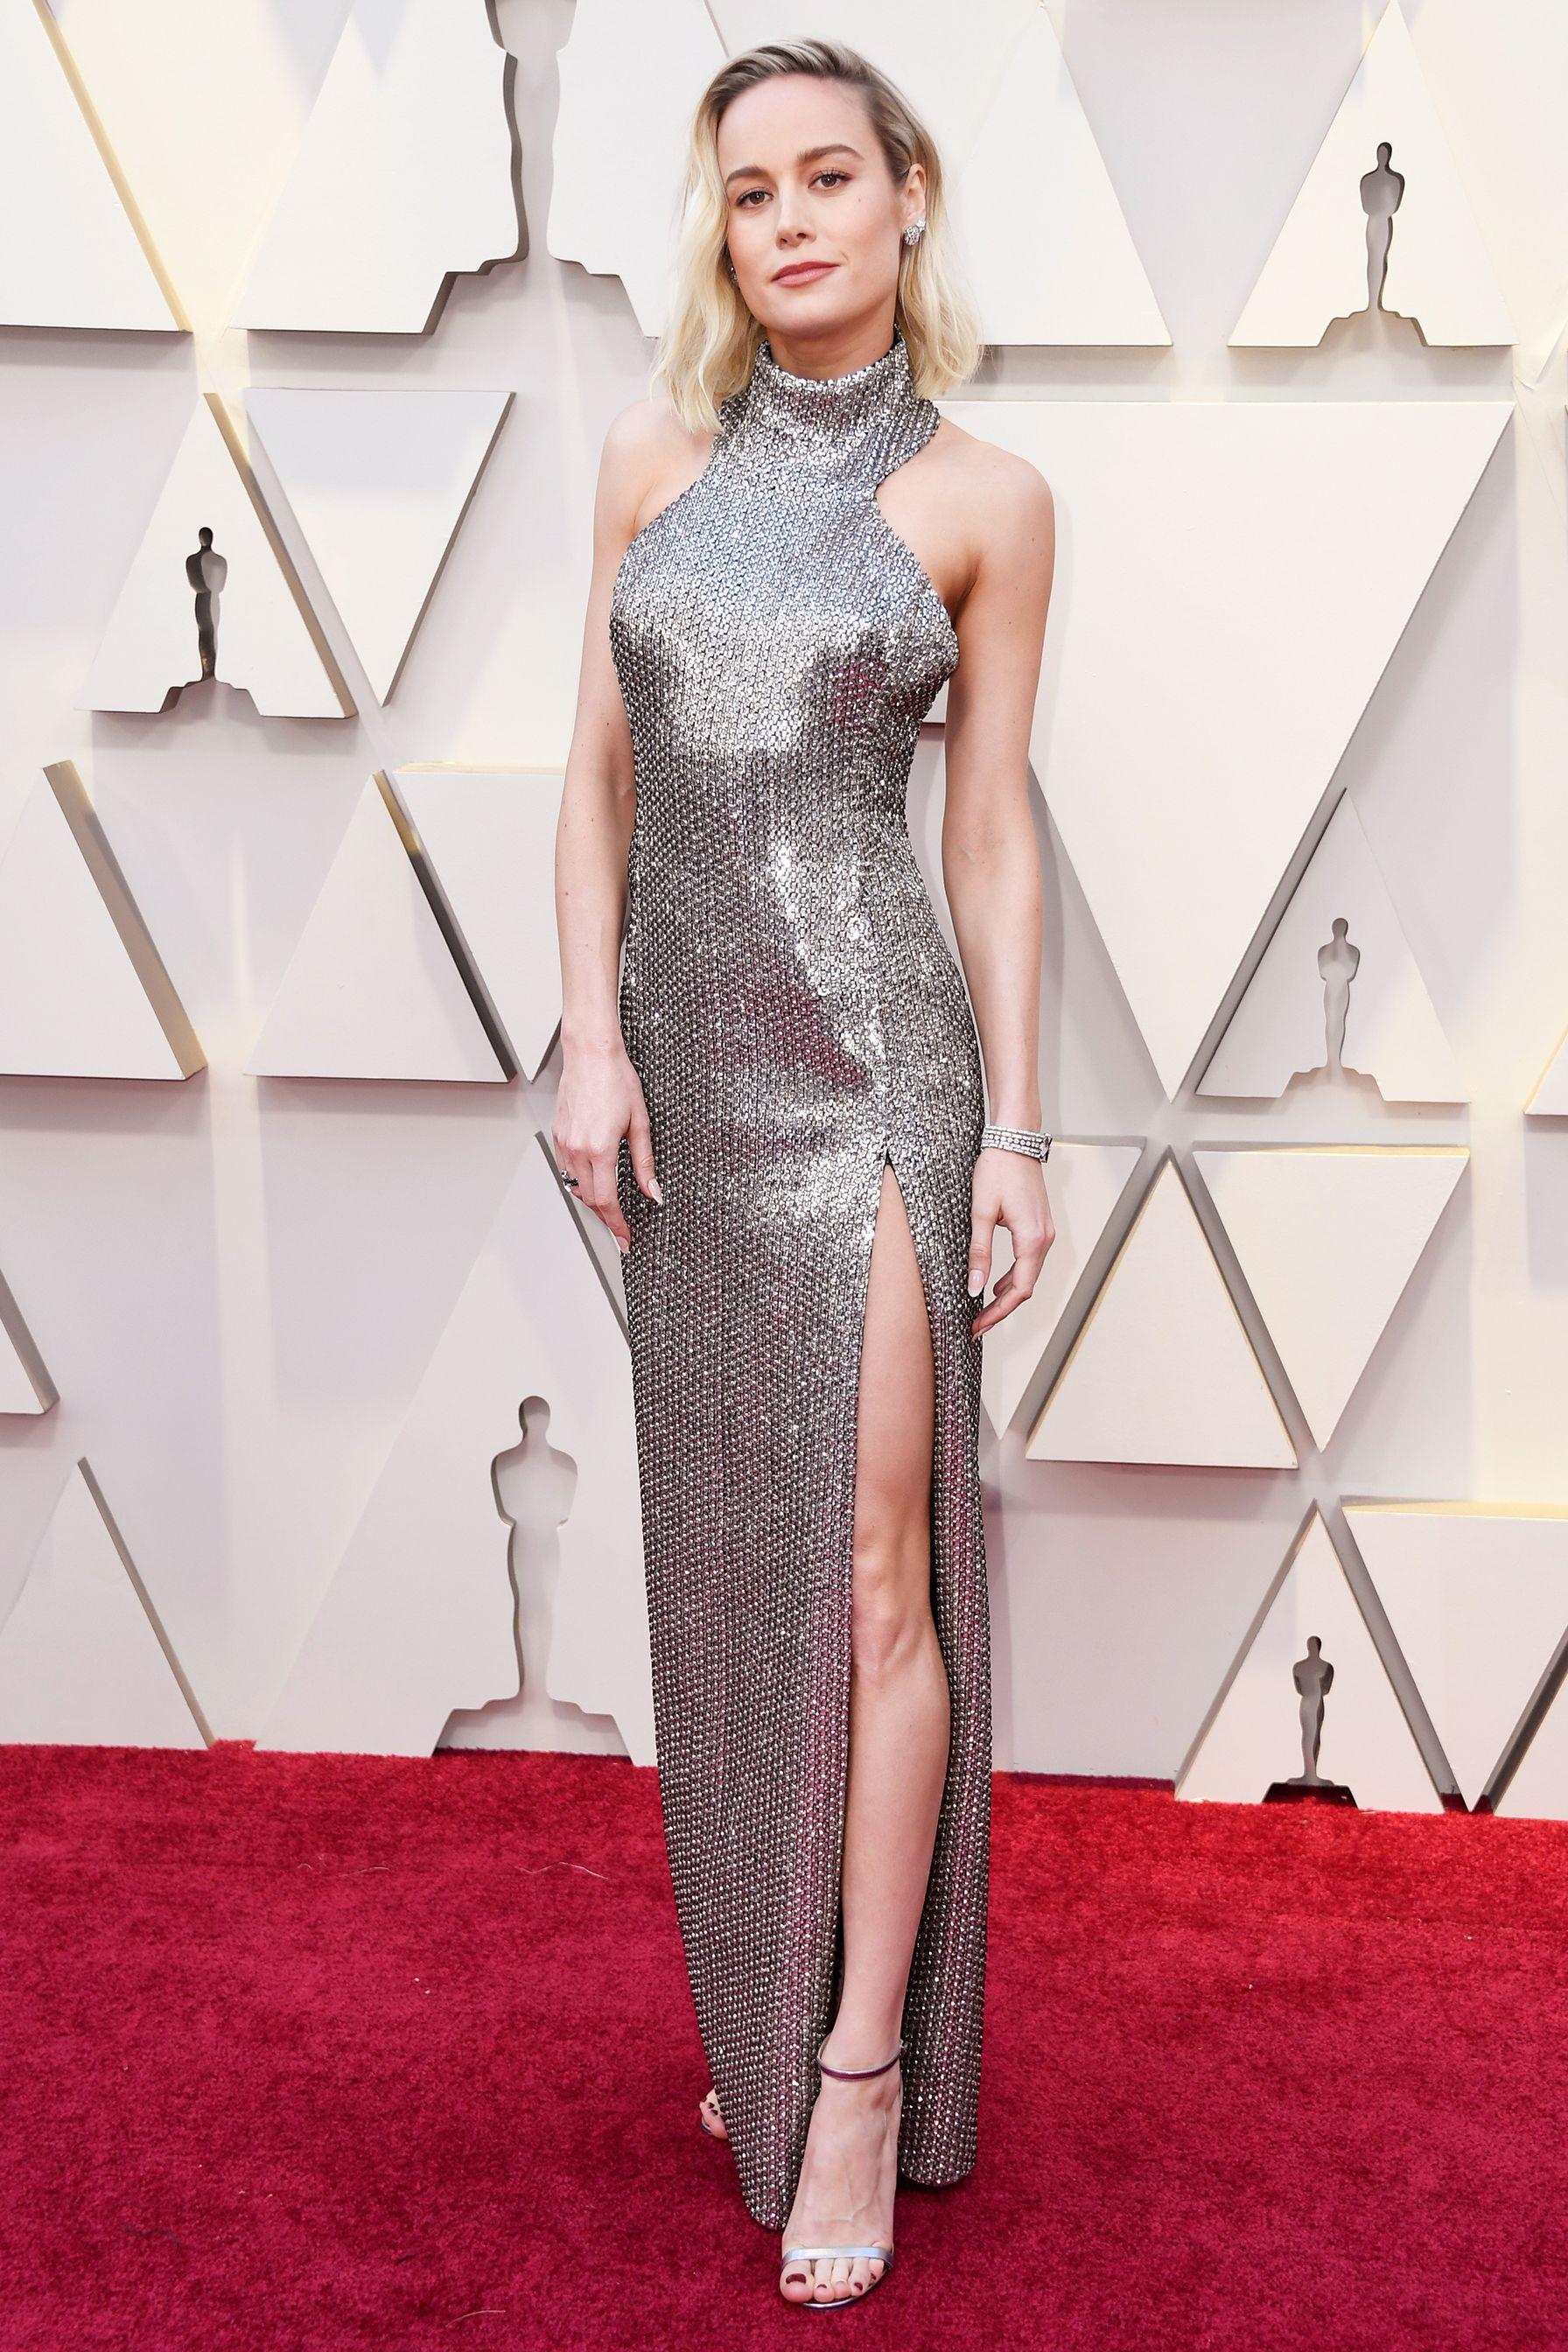 Brie Larson - Oscars red carpet 2019